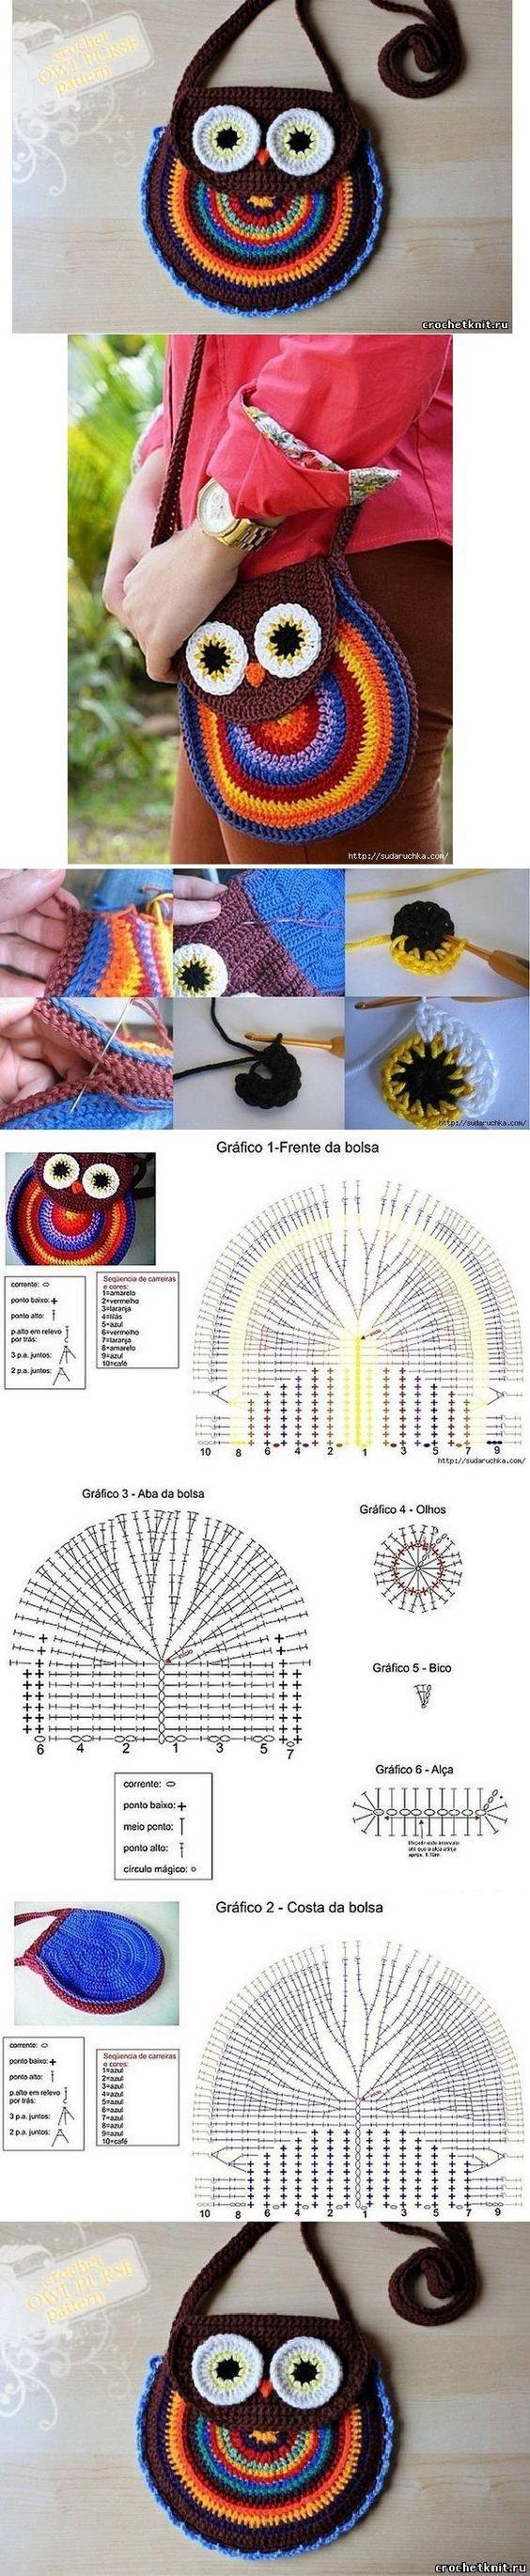 Bolsa de coruja de crochê com gráfico